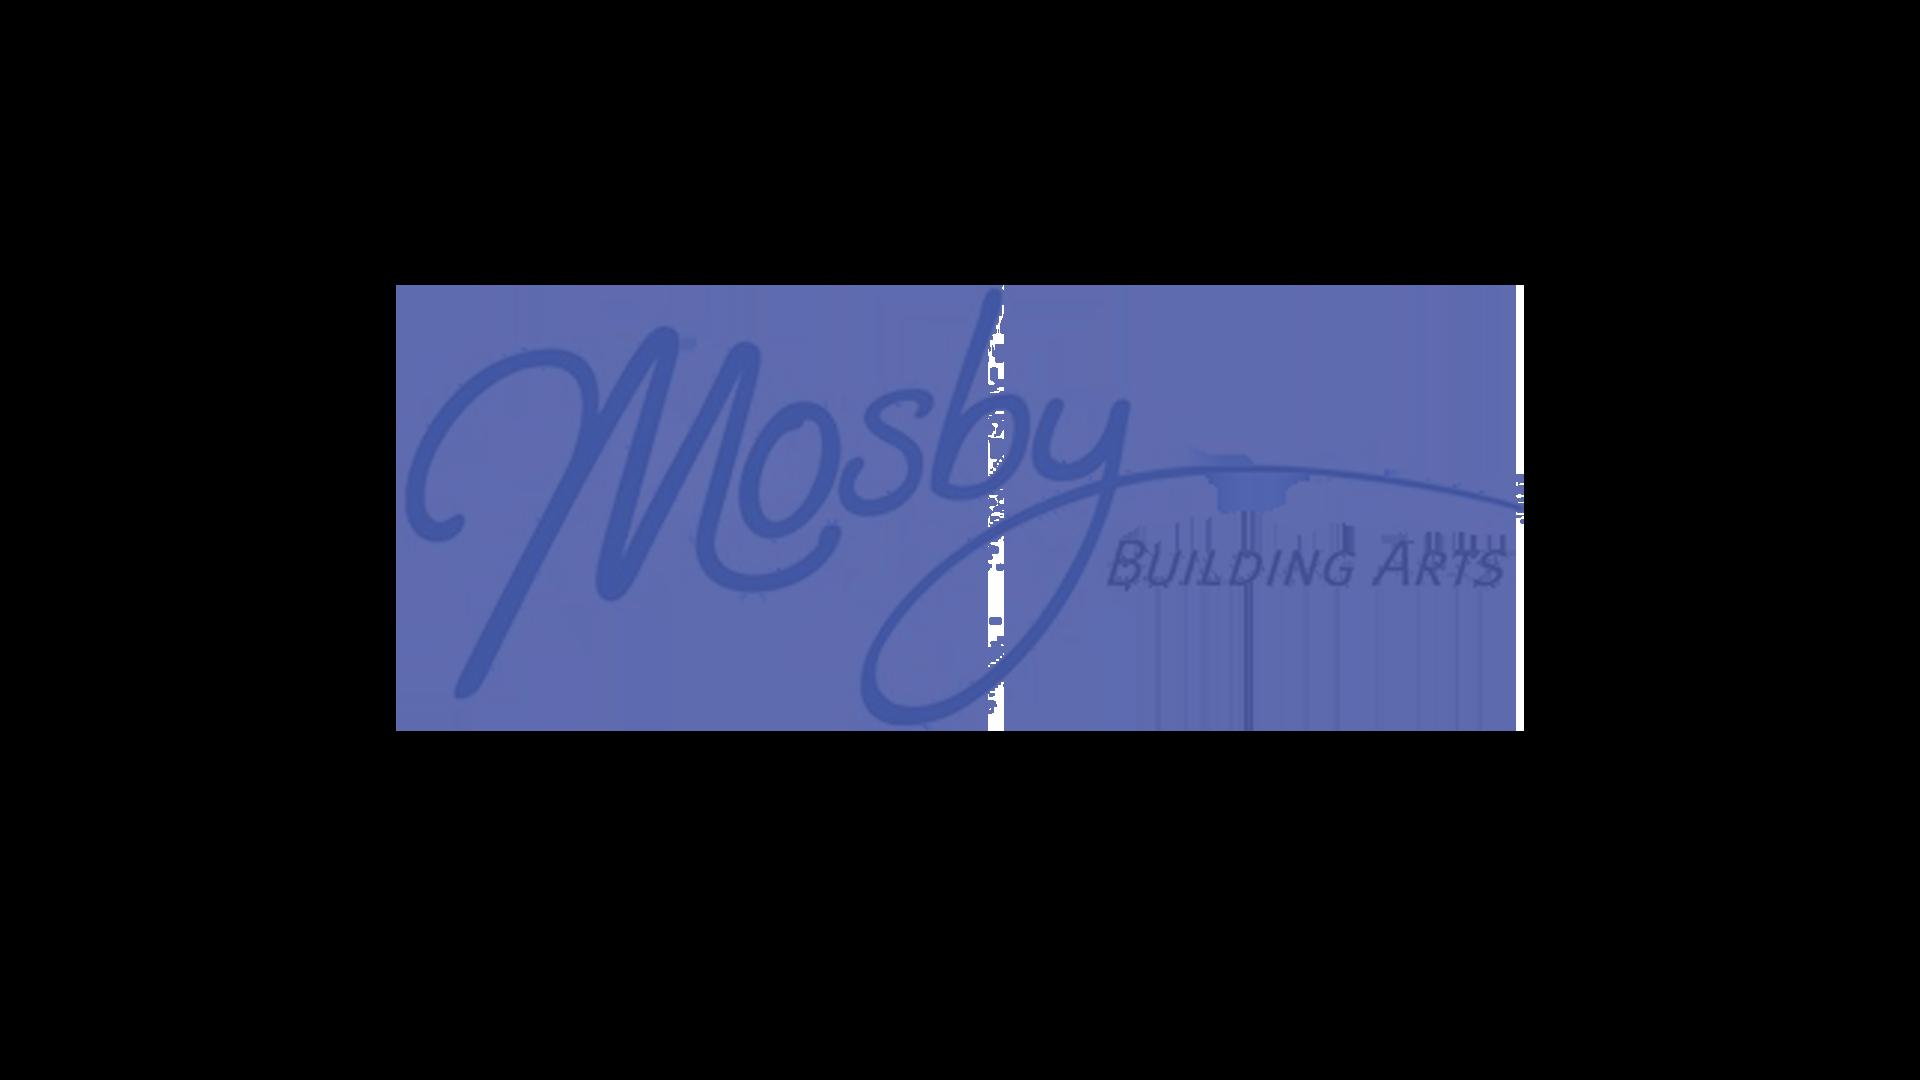 Mosby-building-arts-logo.jpg.png